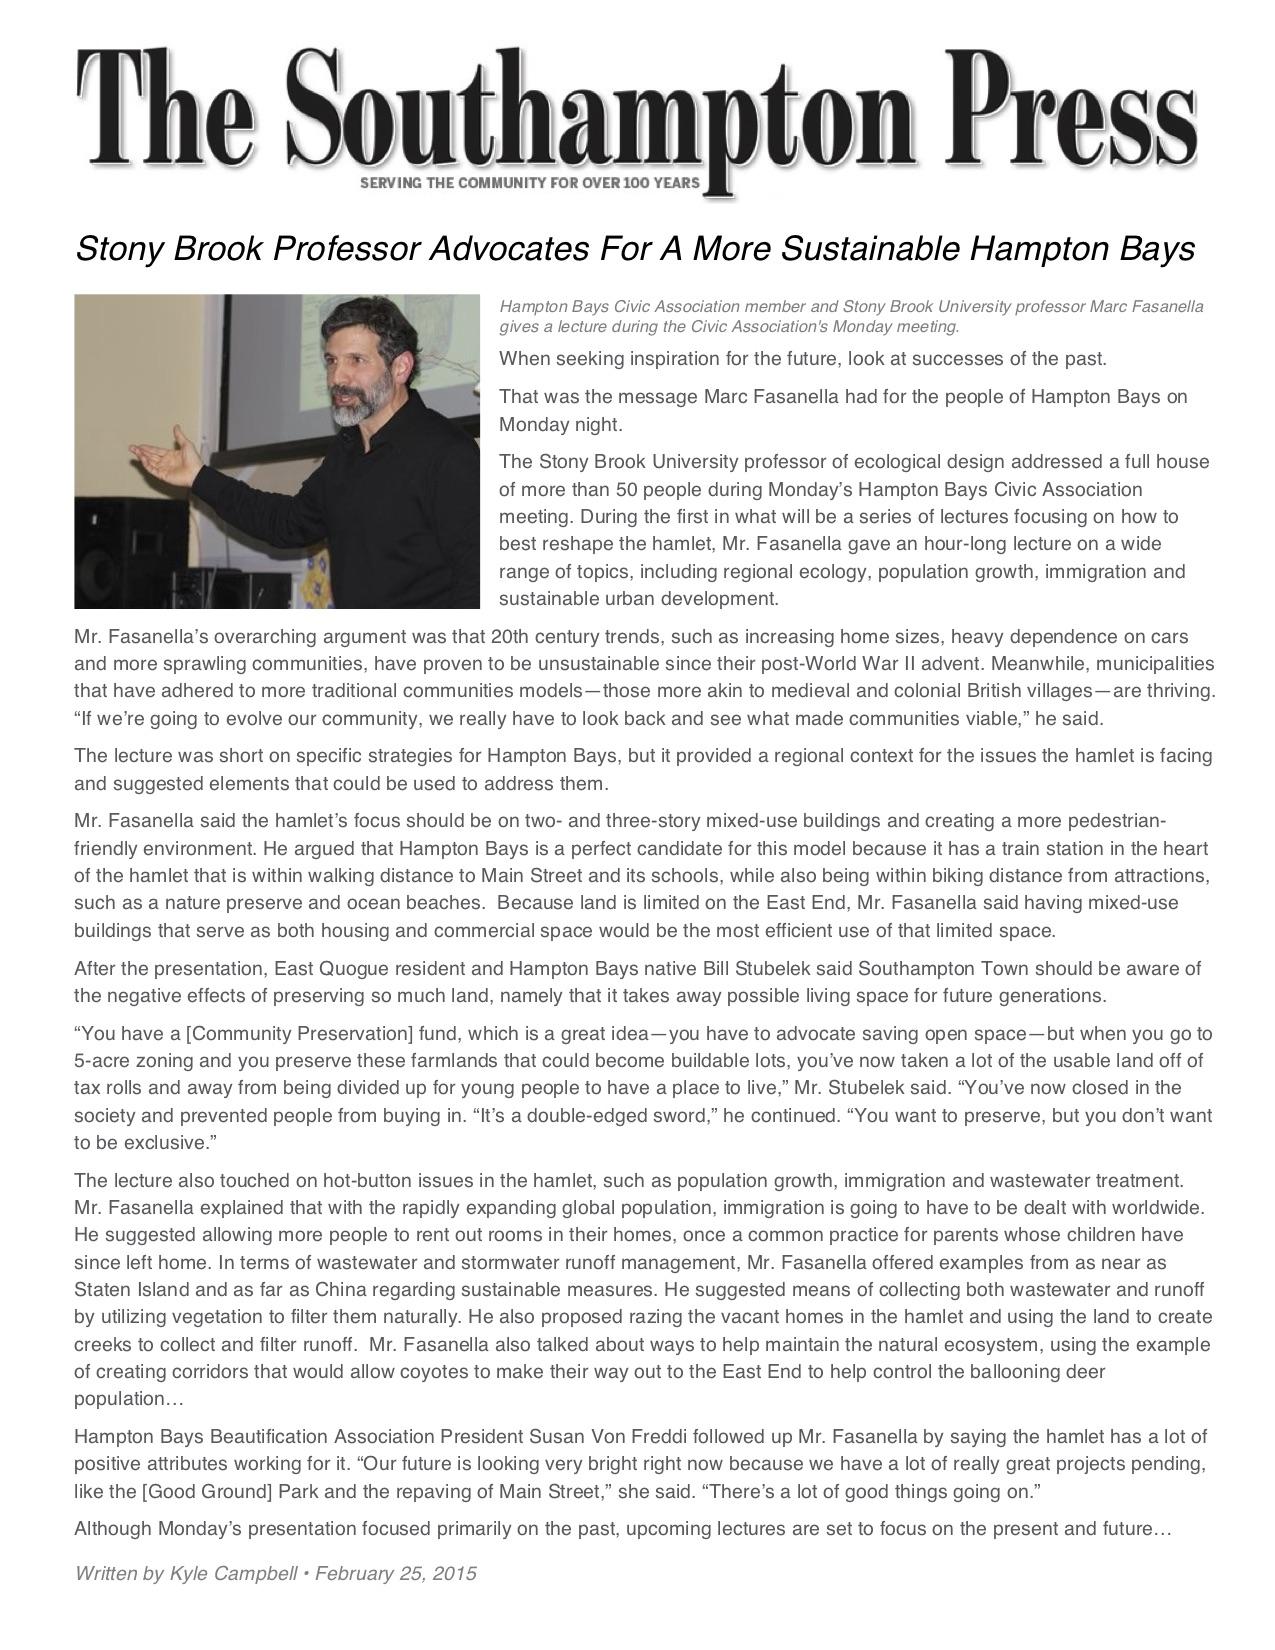 Stony Brook Professor Advocates For A More Sustainable Hampton Bays.jpg